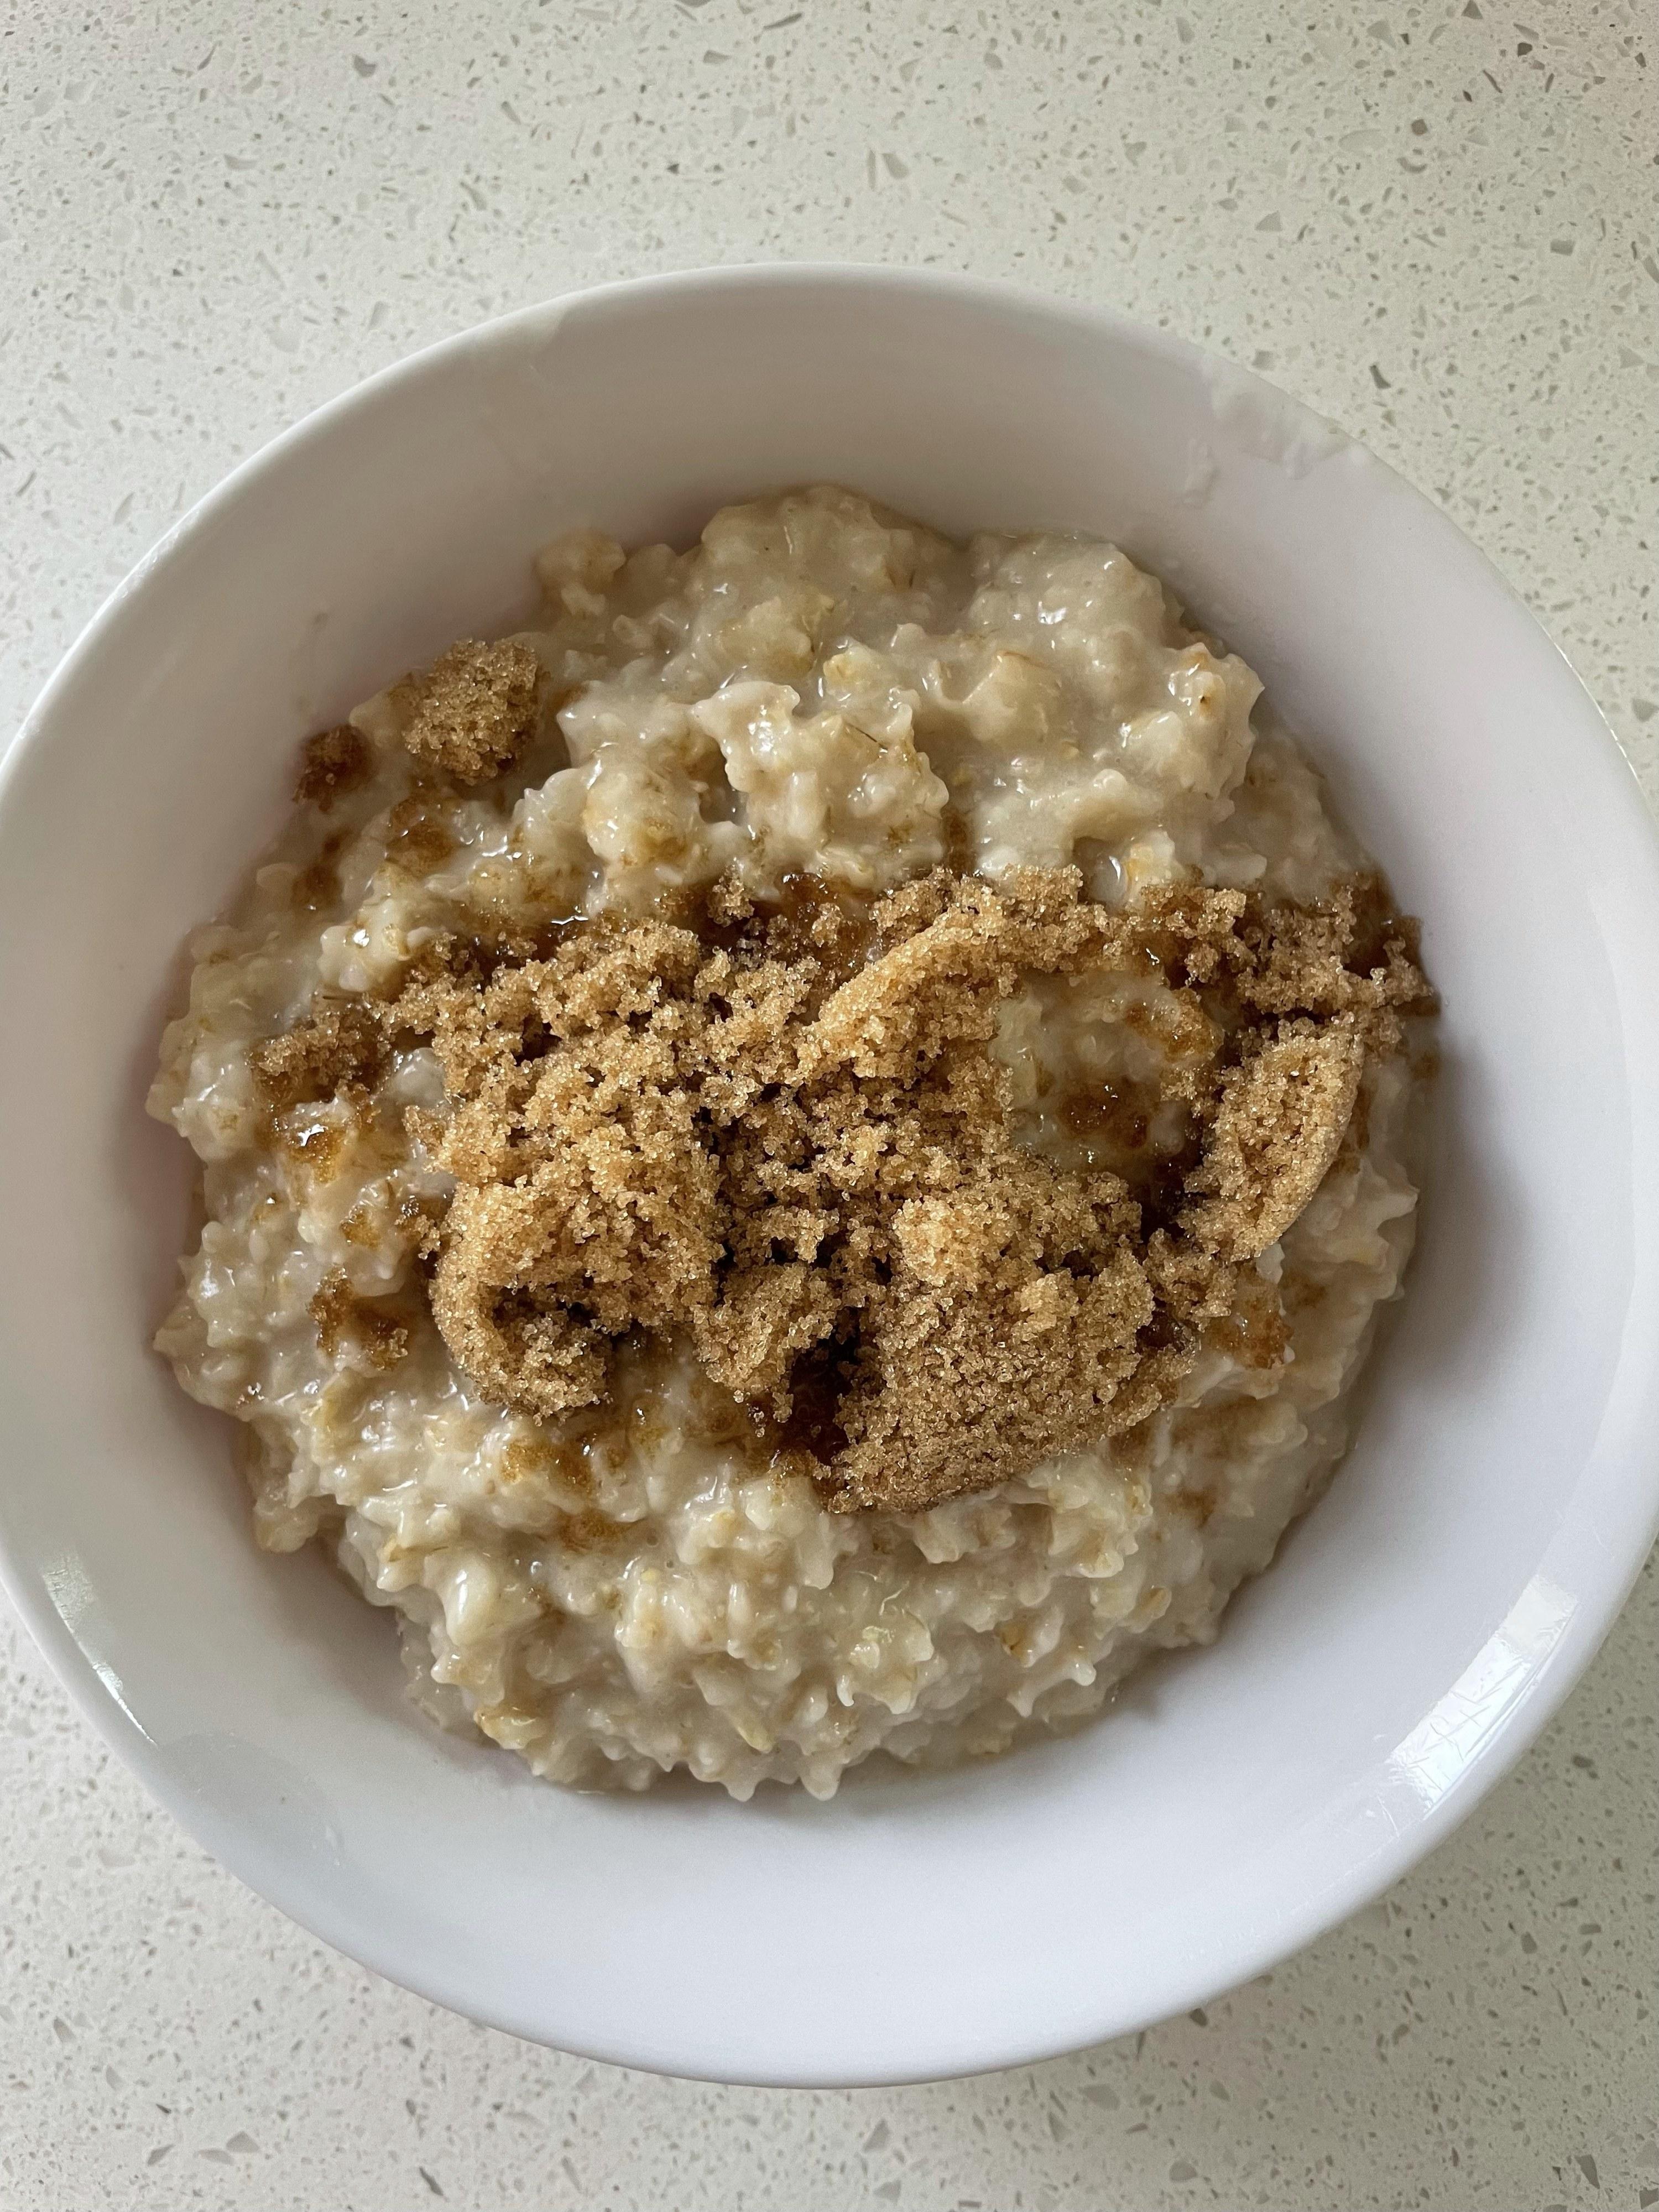 A bowl of brown-sugar oatmeal